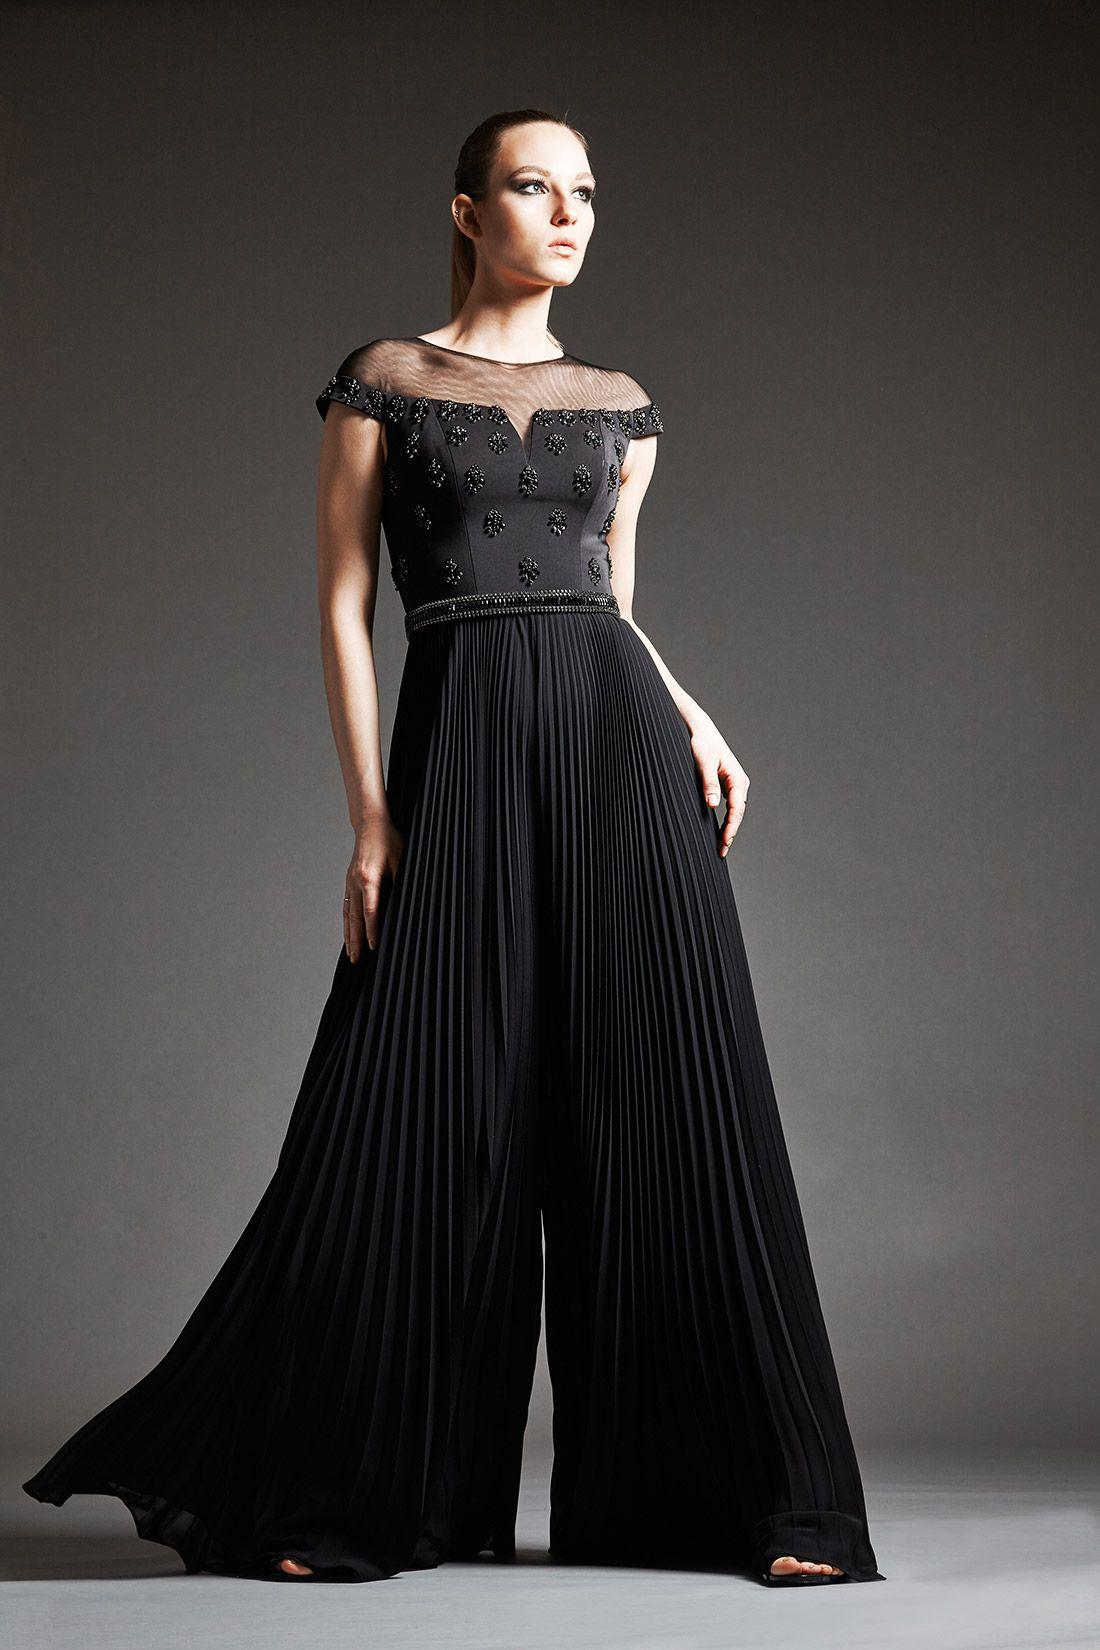 42+ What wedding dress suits broad shoulders information